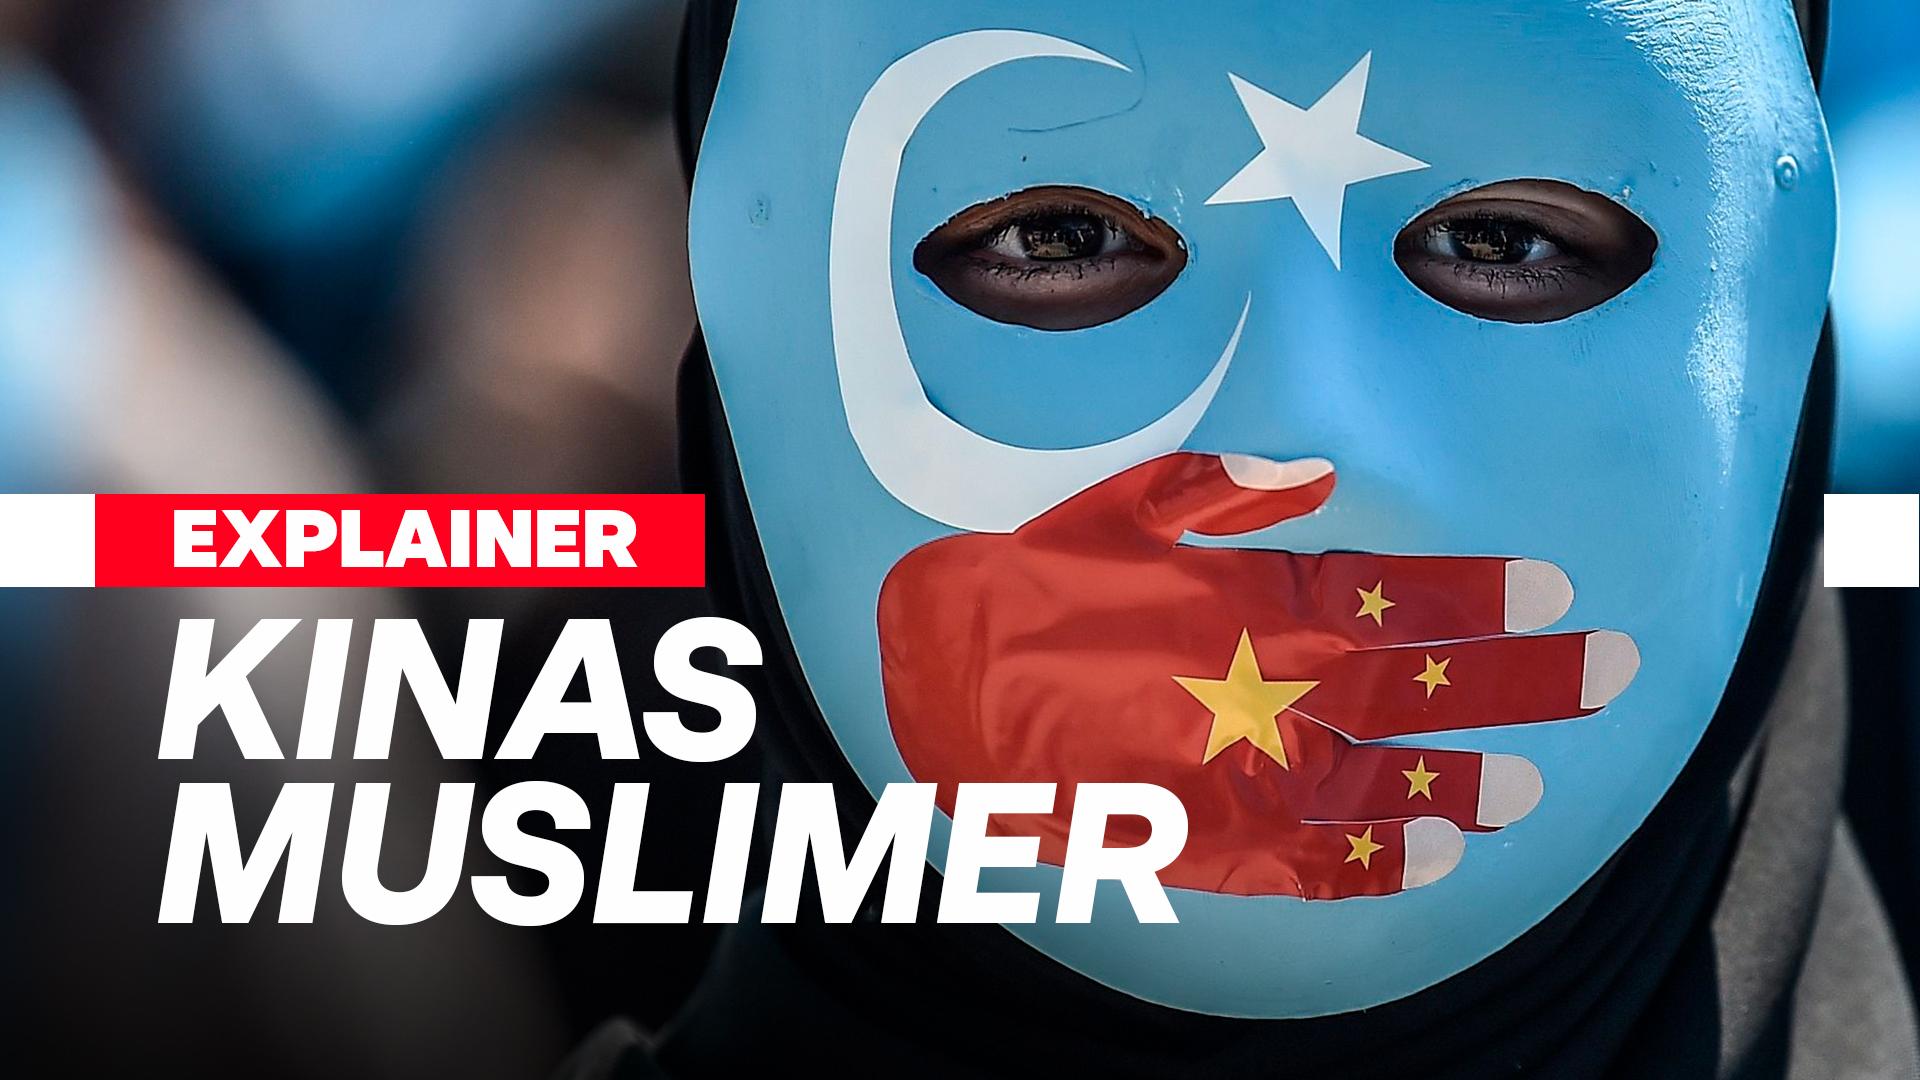 Hvorfor undertrykkes muslimer i Kina?